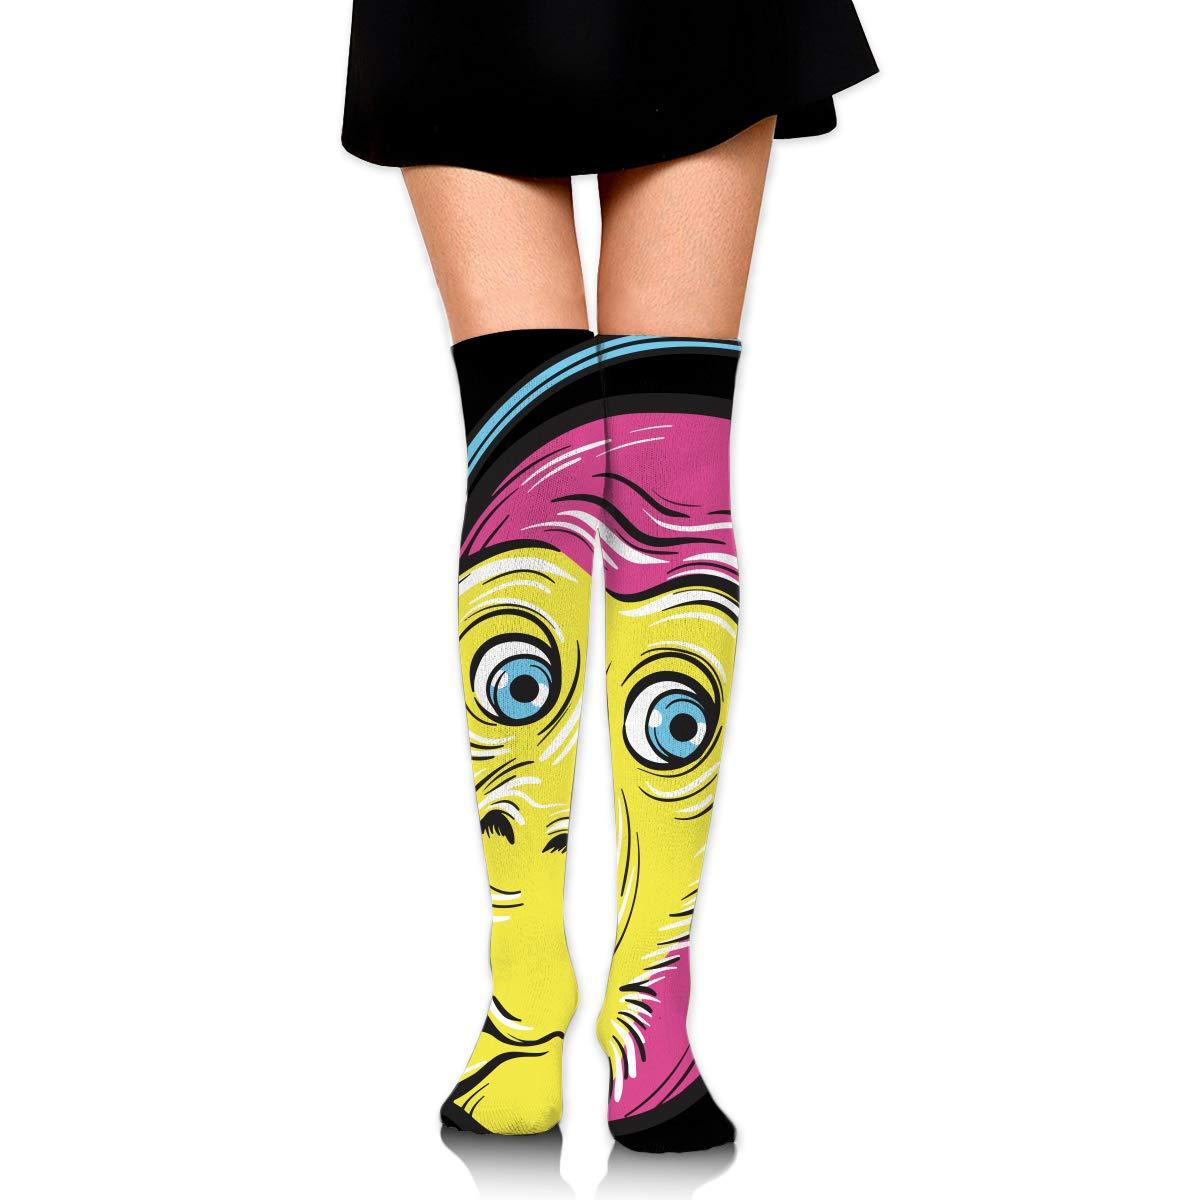 Womens//Girls Monkey Wearing Headphones Casual Socks Yoga Socks Over The Knee High Socks 23.6